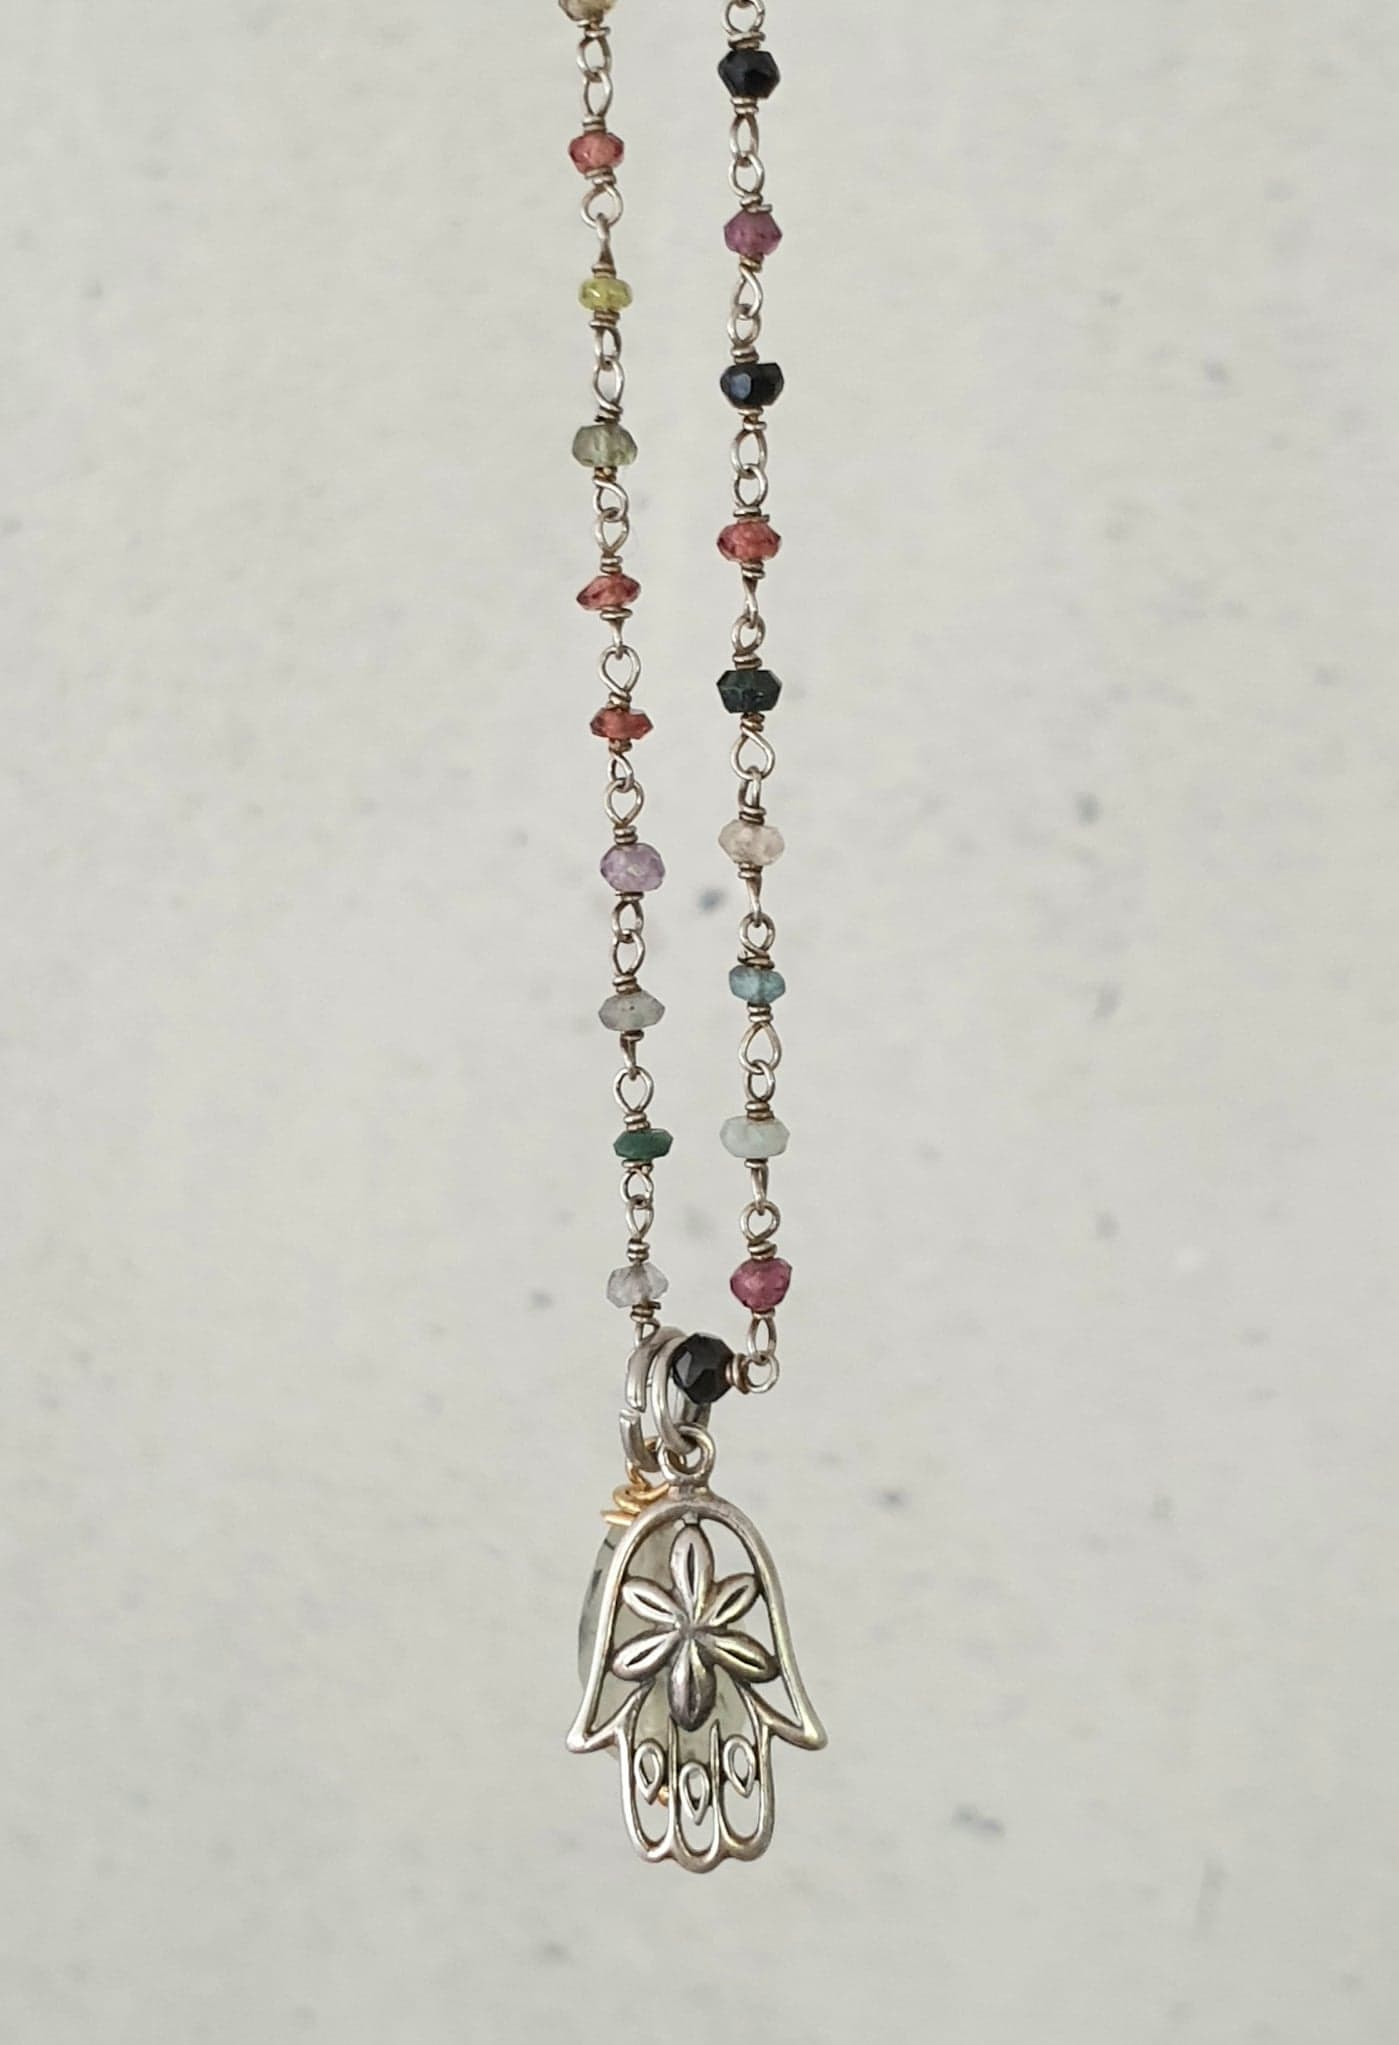 Rosary kæde i med halvædelstene, sølv hamsa hånd